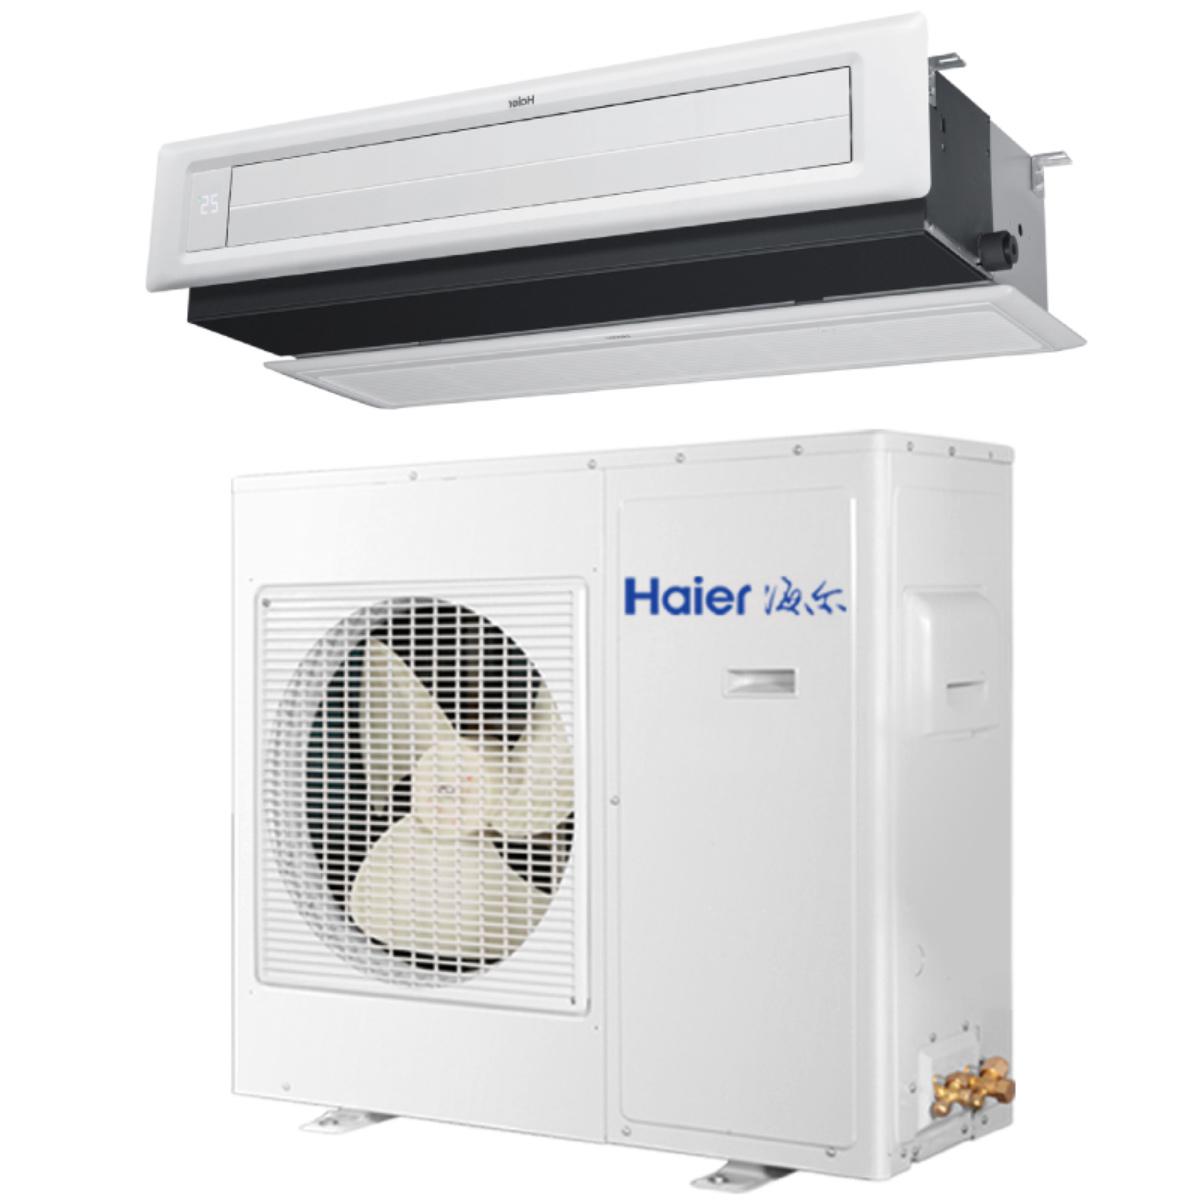 Haier/海尔 定频风管机 智尊系列 KFRd-27NW/53PAA12